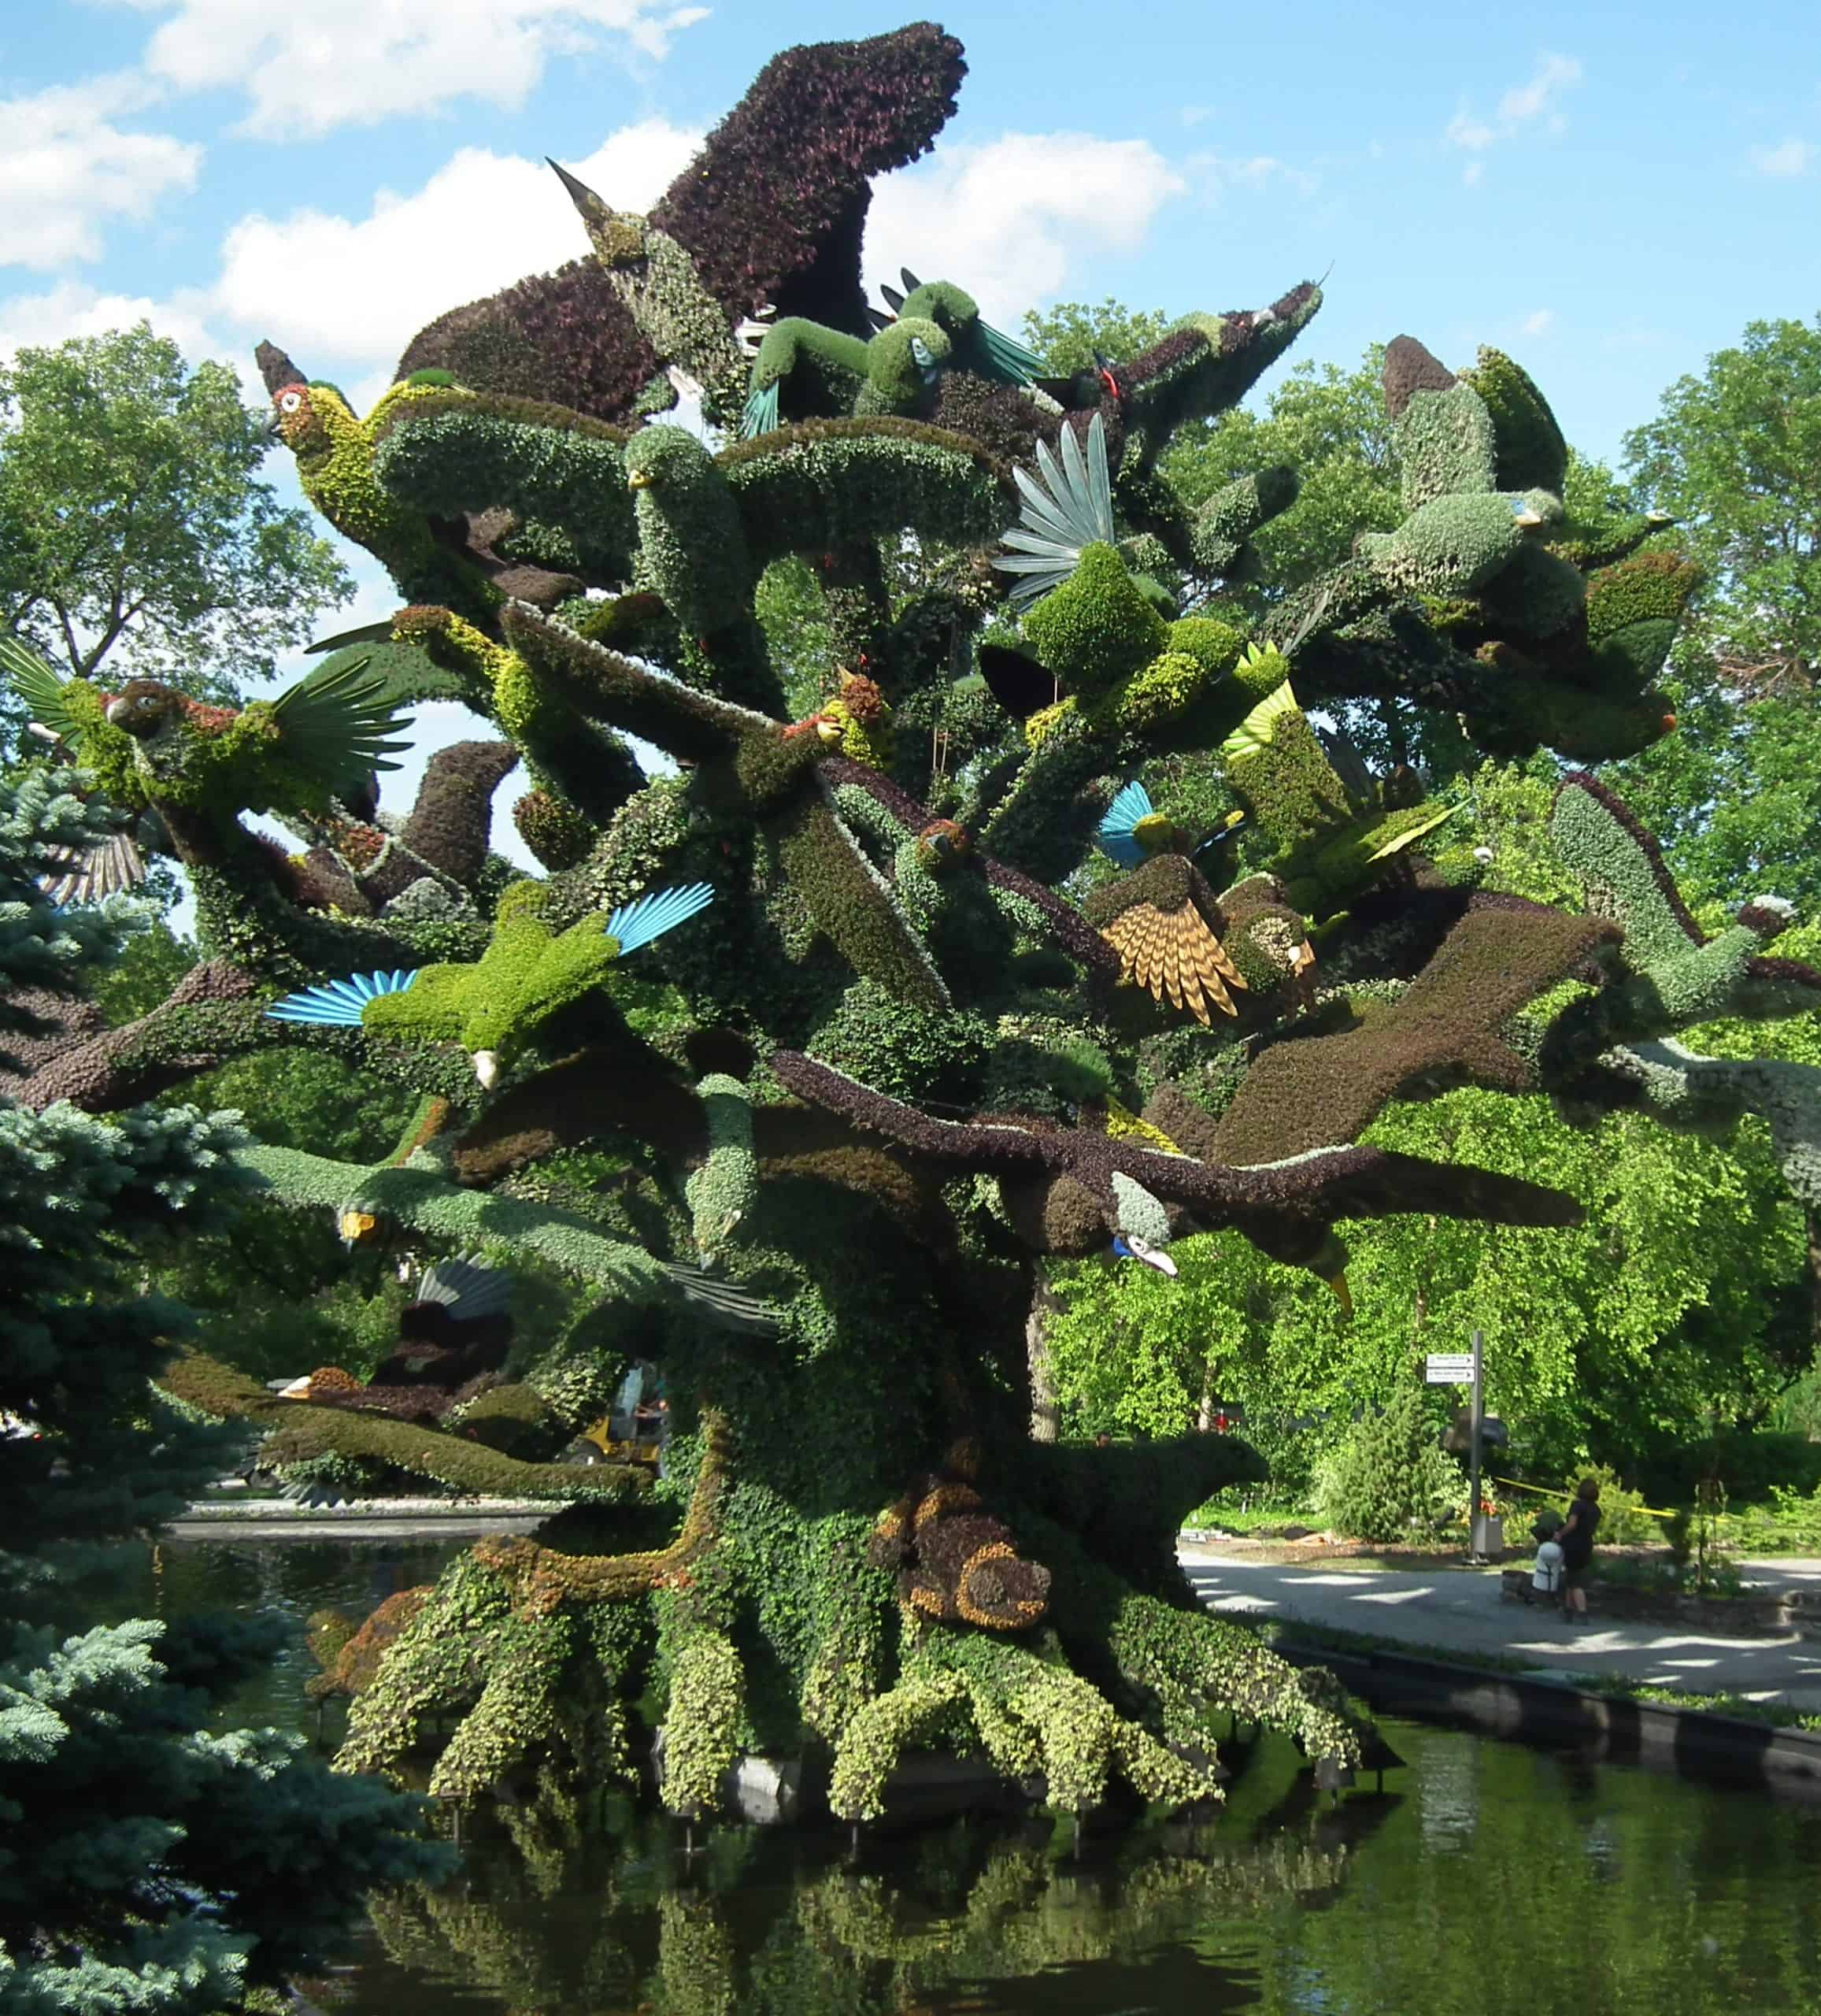 Tree of Birds honours endangered species.